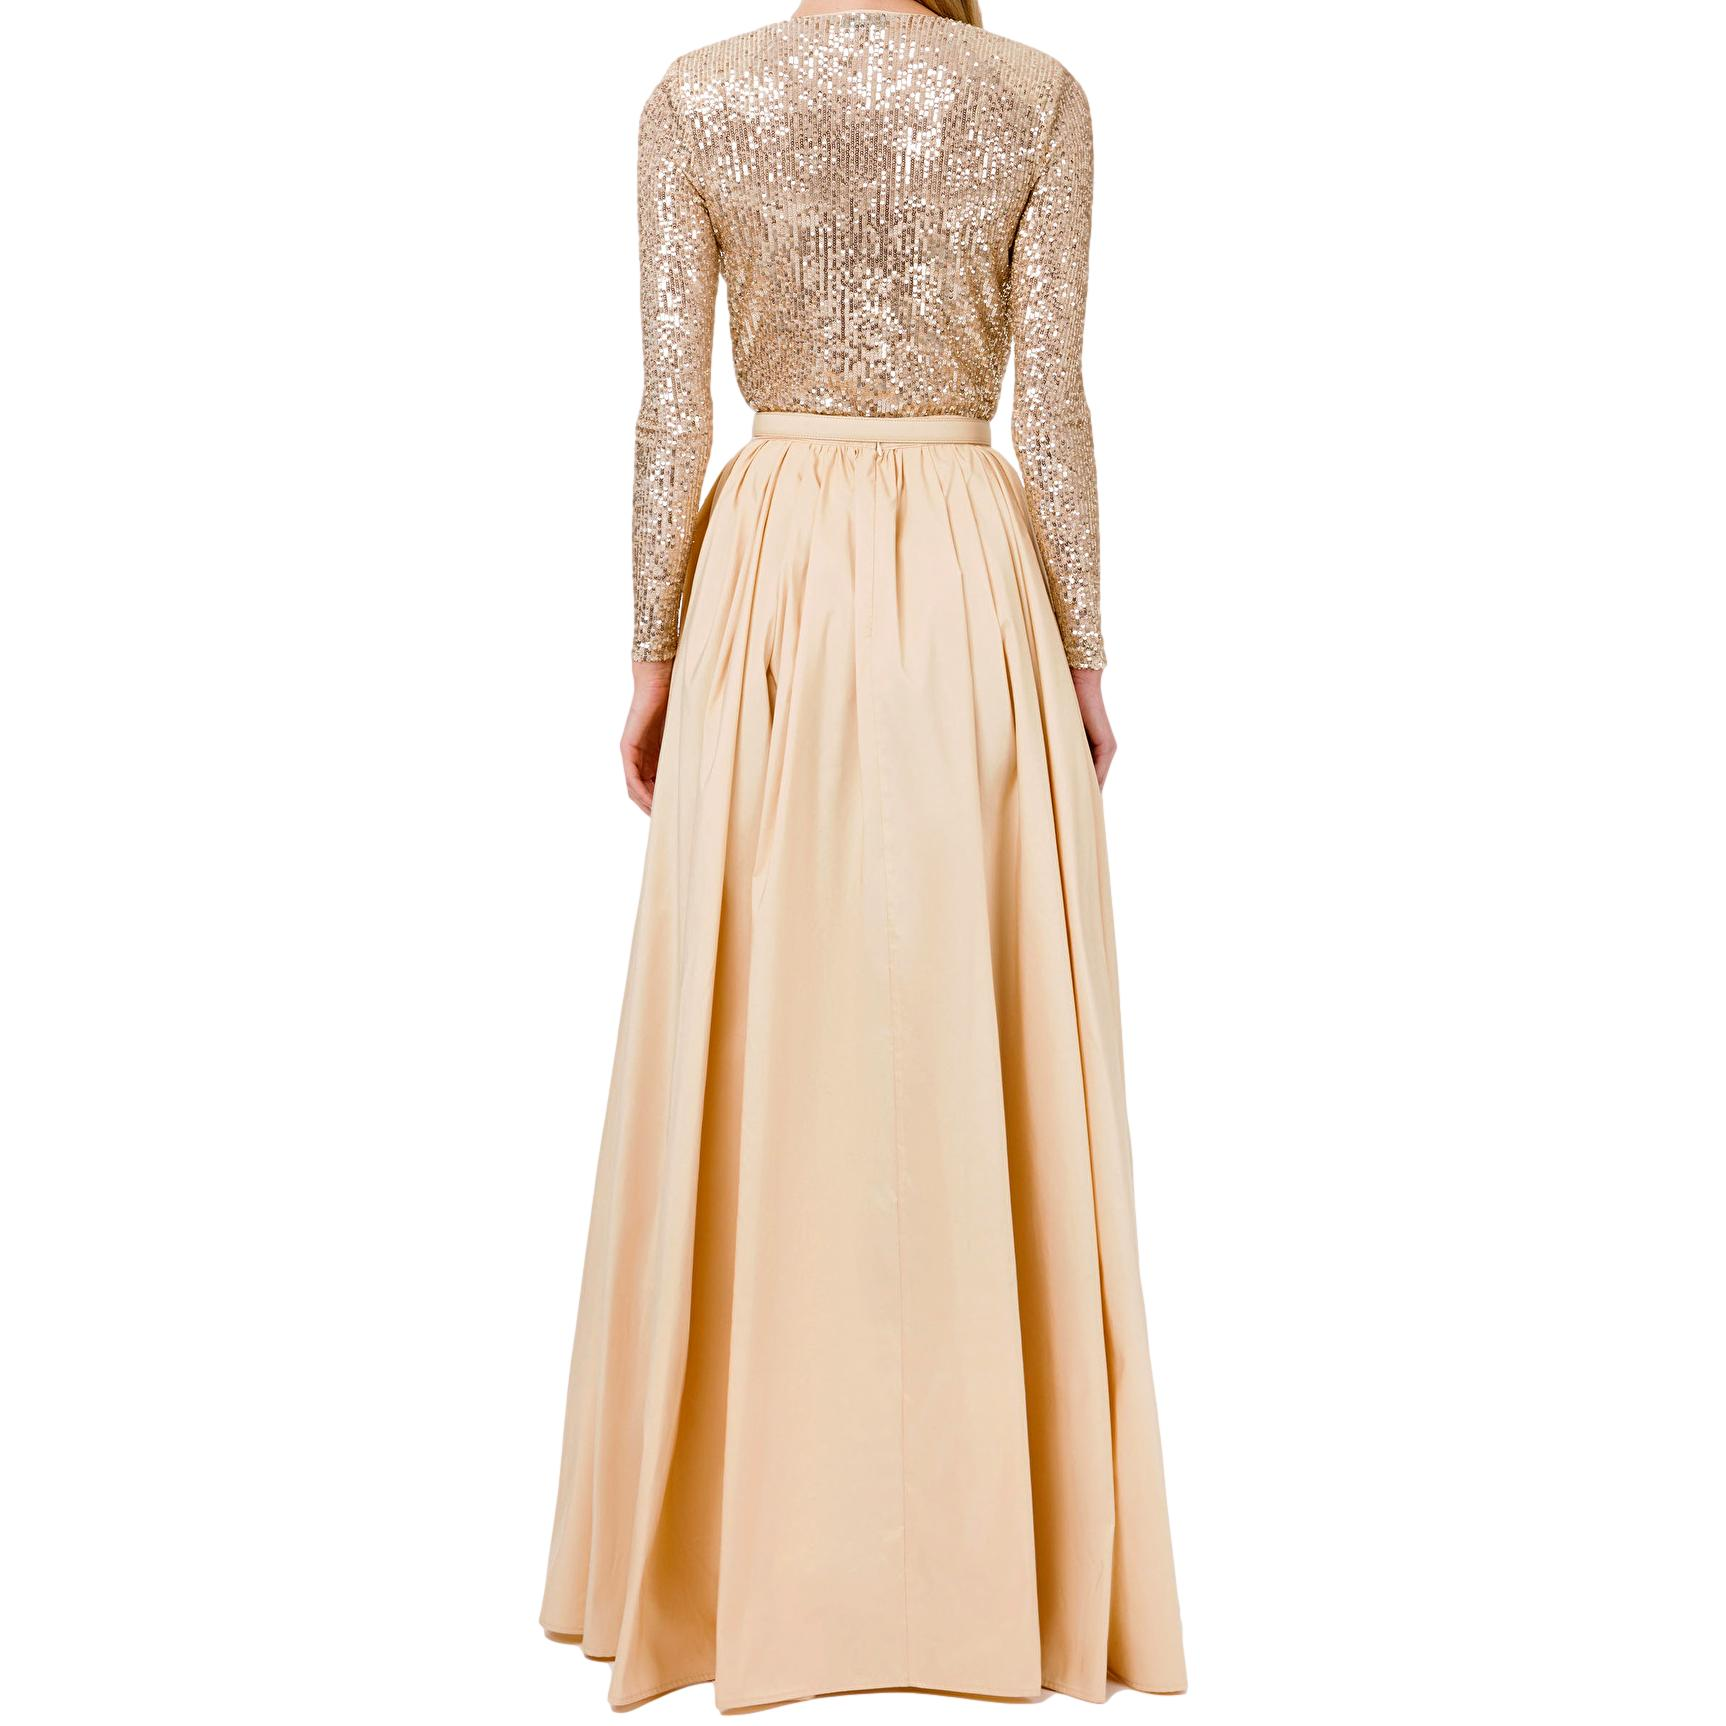 Red Carpet outfit with sequin bodysuit and taffeta skirt ELISABETTA FRANCHI |  | BG00111E2Q61